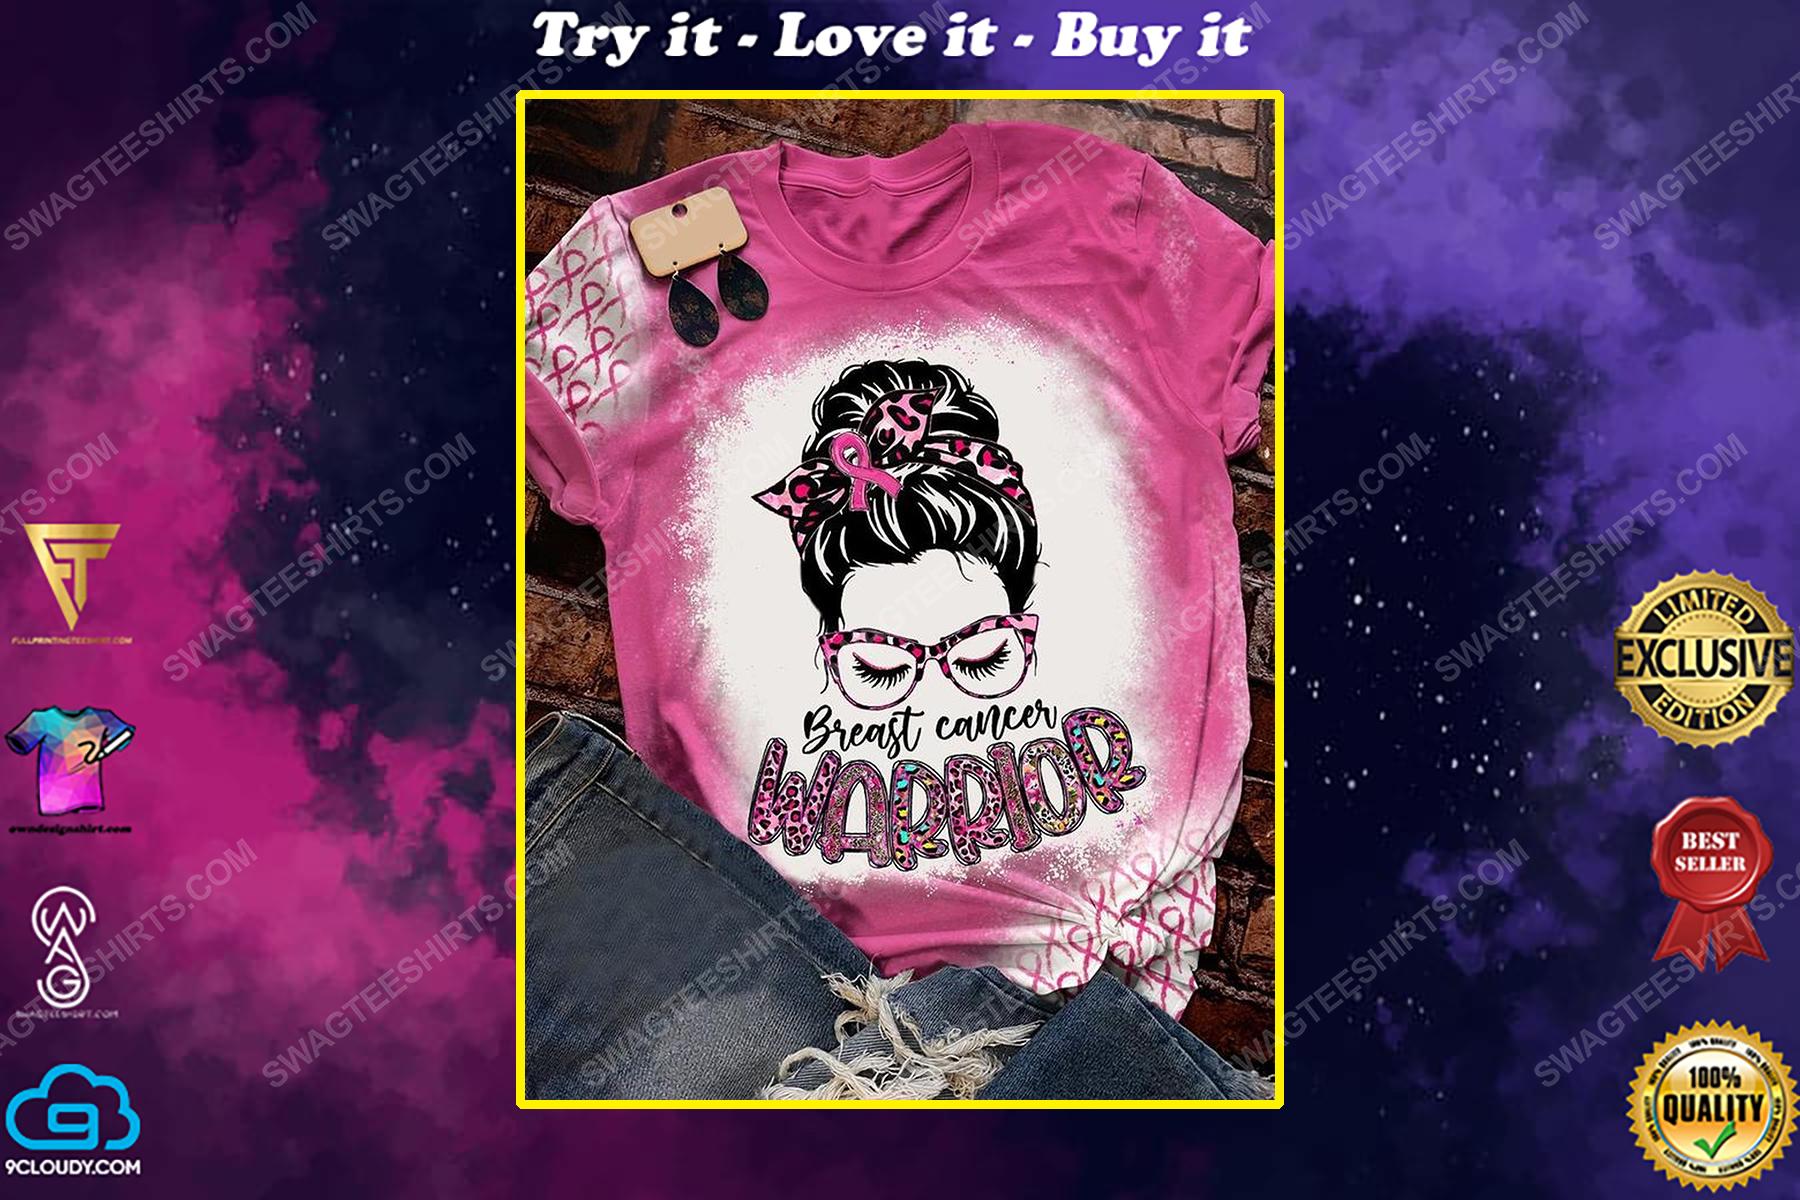 Breast cancer warrior leopard full print shirt